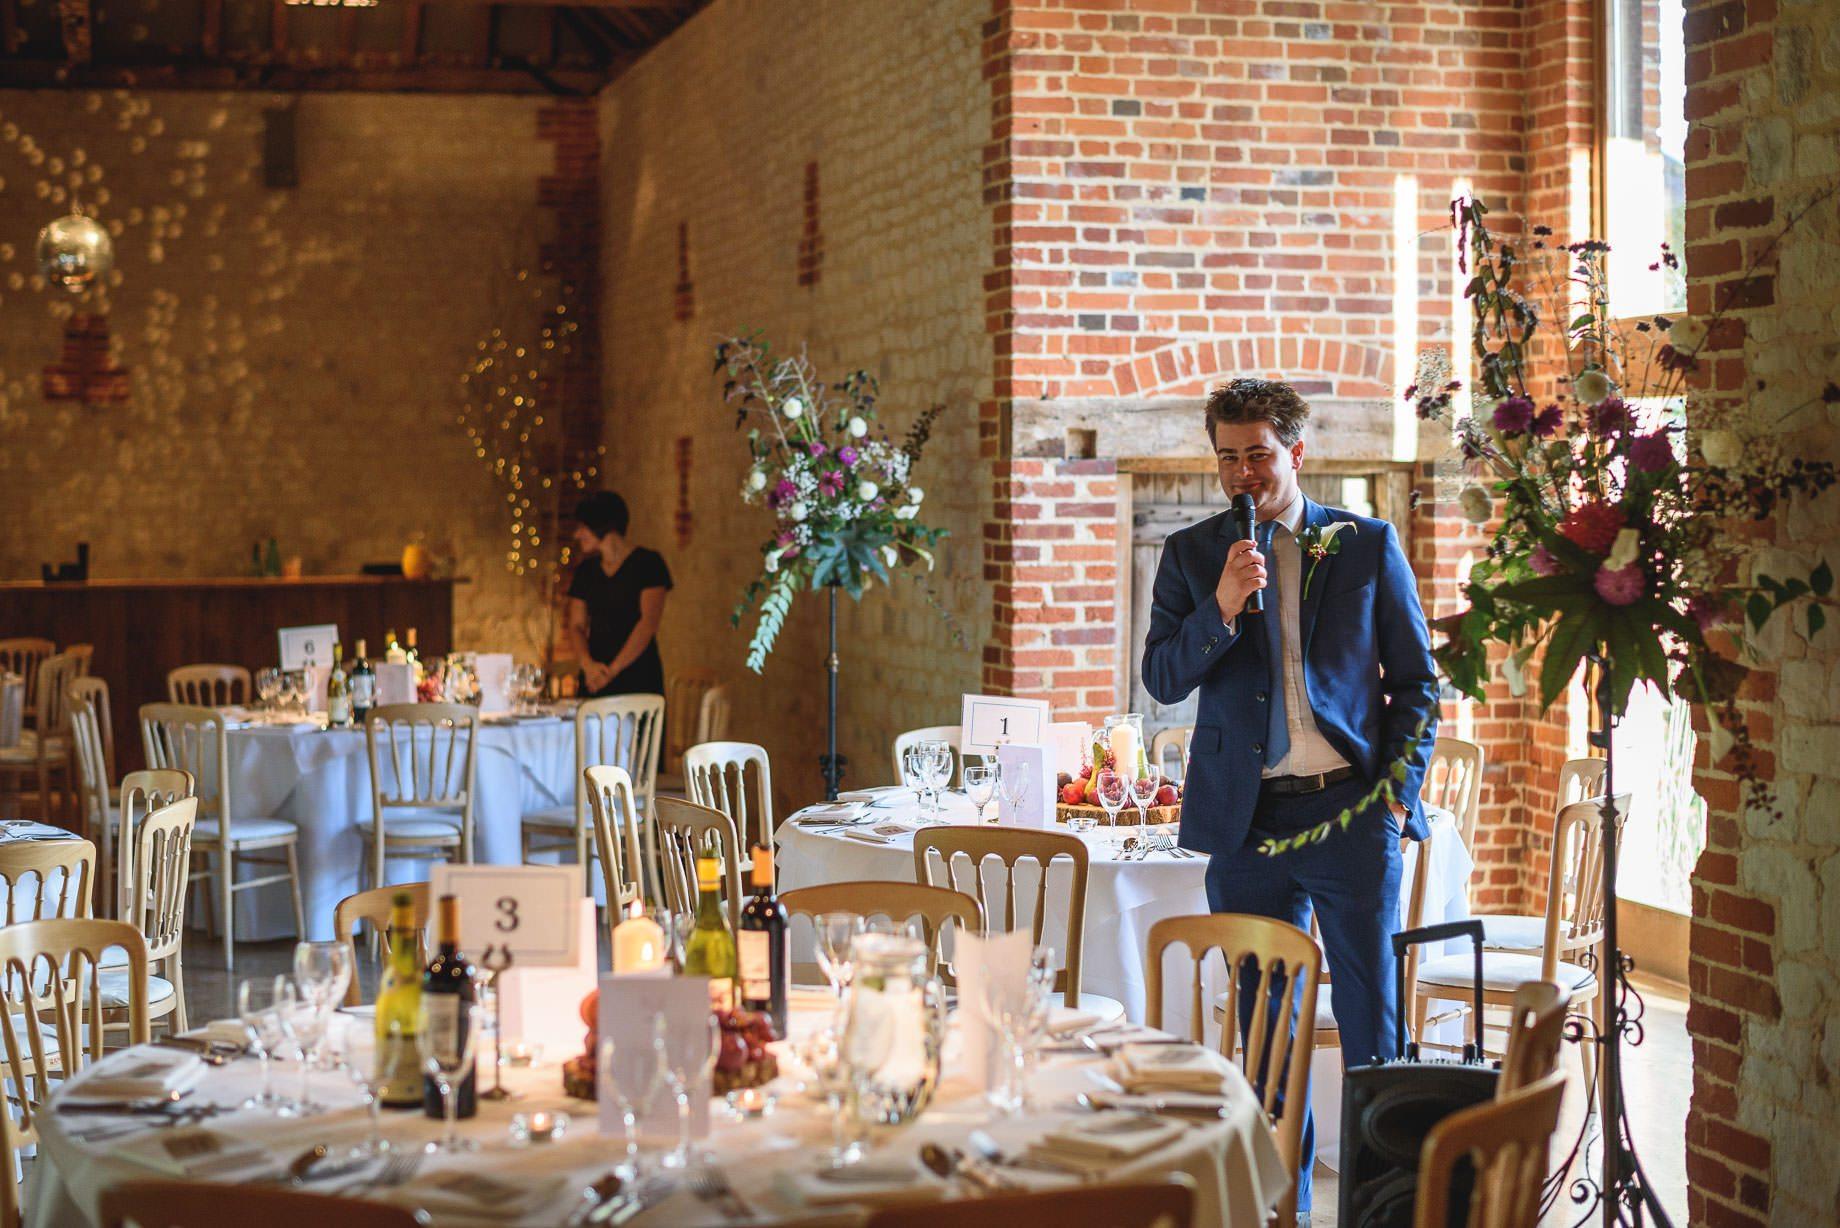 bury-court-barn-wedding-photography-guy-collier-photography-nadia-tom-132-of-184